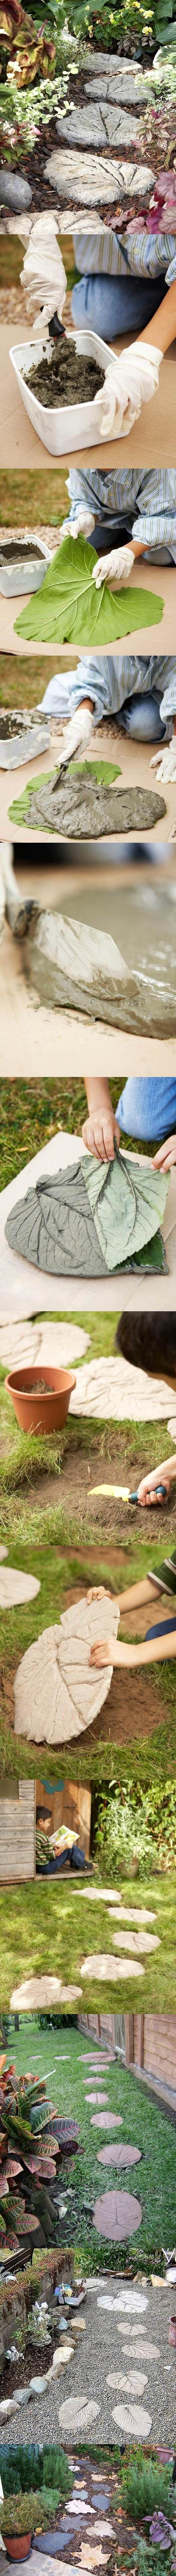 Feuille De Pierre Stoneleaf stone leaf garden path   allées de jardin en pierre, allées